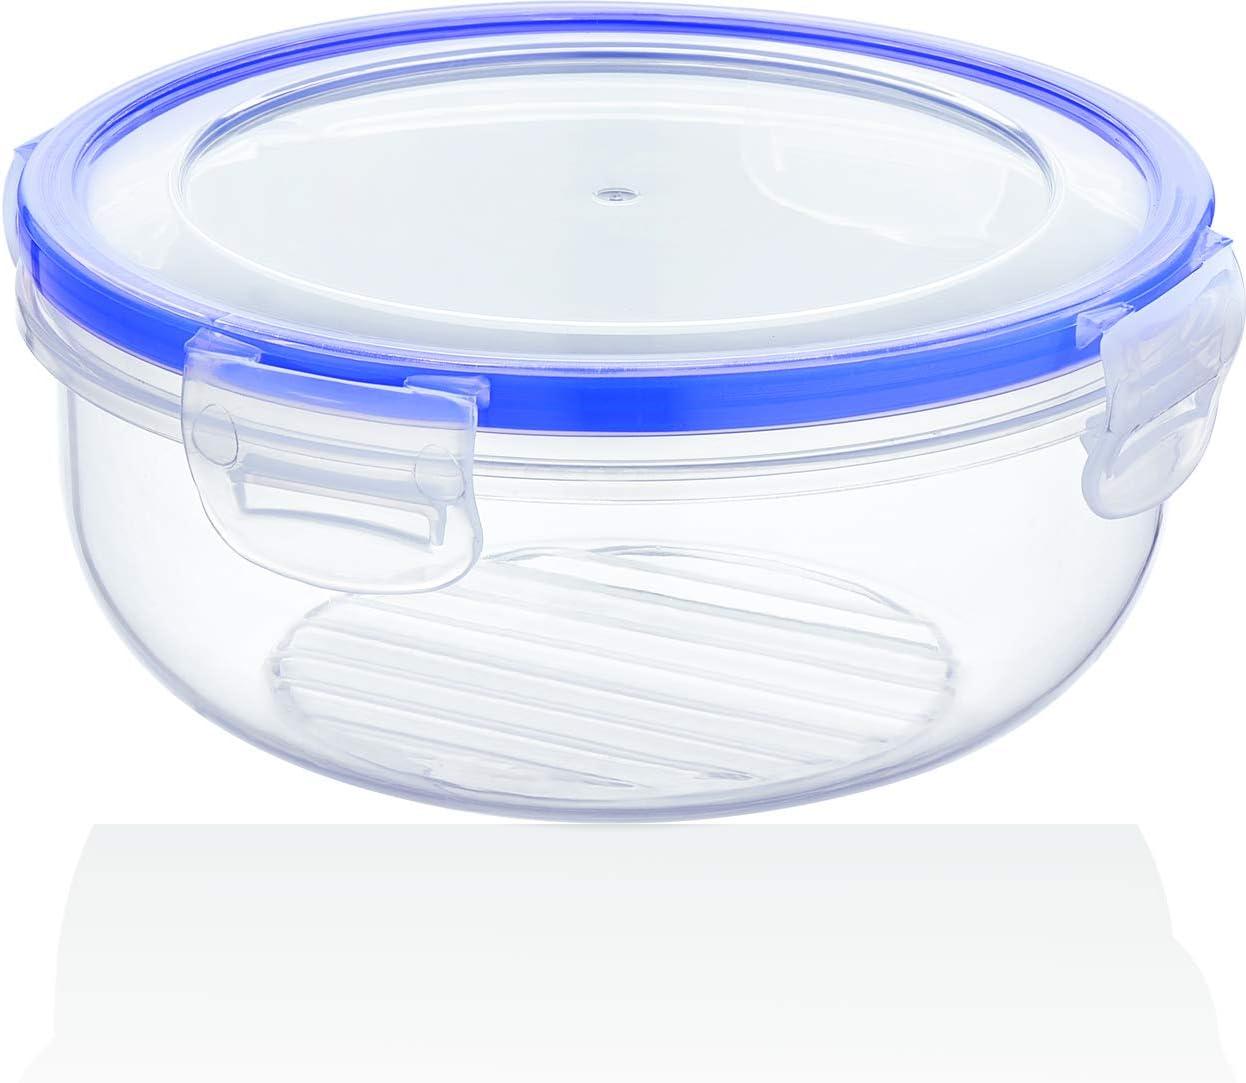 BAGER 2er Set Frischhaltedose Vorratsdosen Mikrowellengeeignet 2250ml BPA frei Klickverschluss